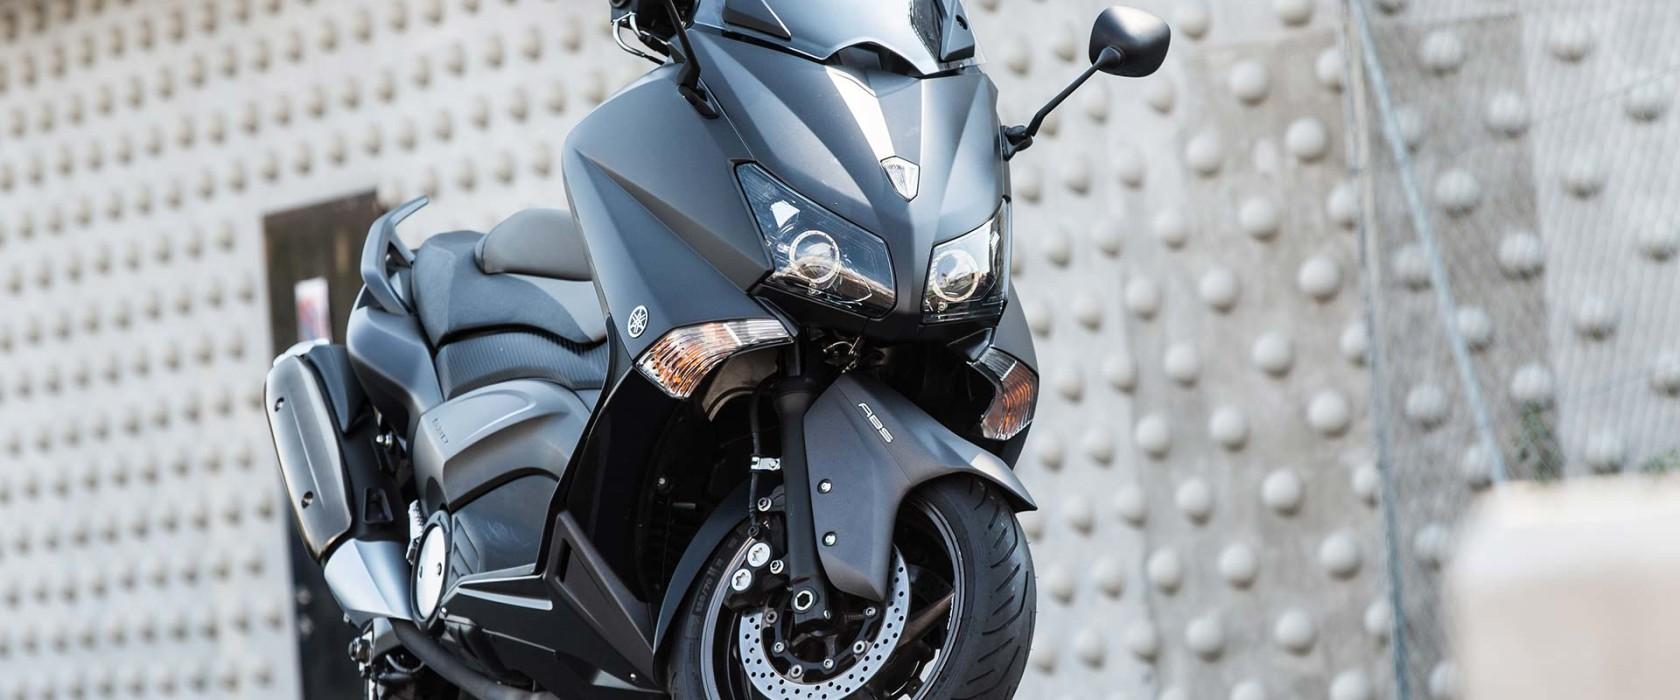 MichelinPilotPower3SC-001